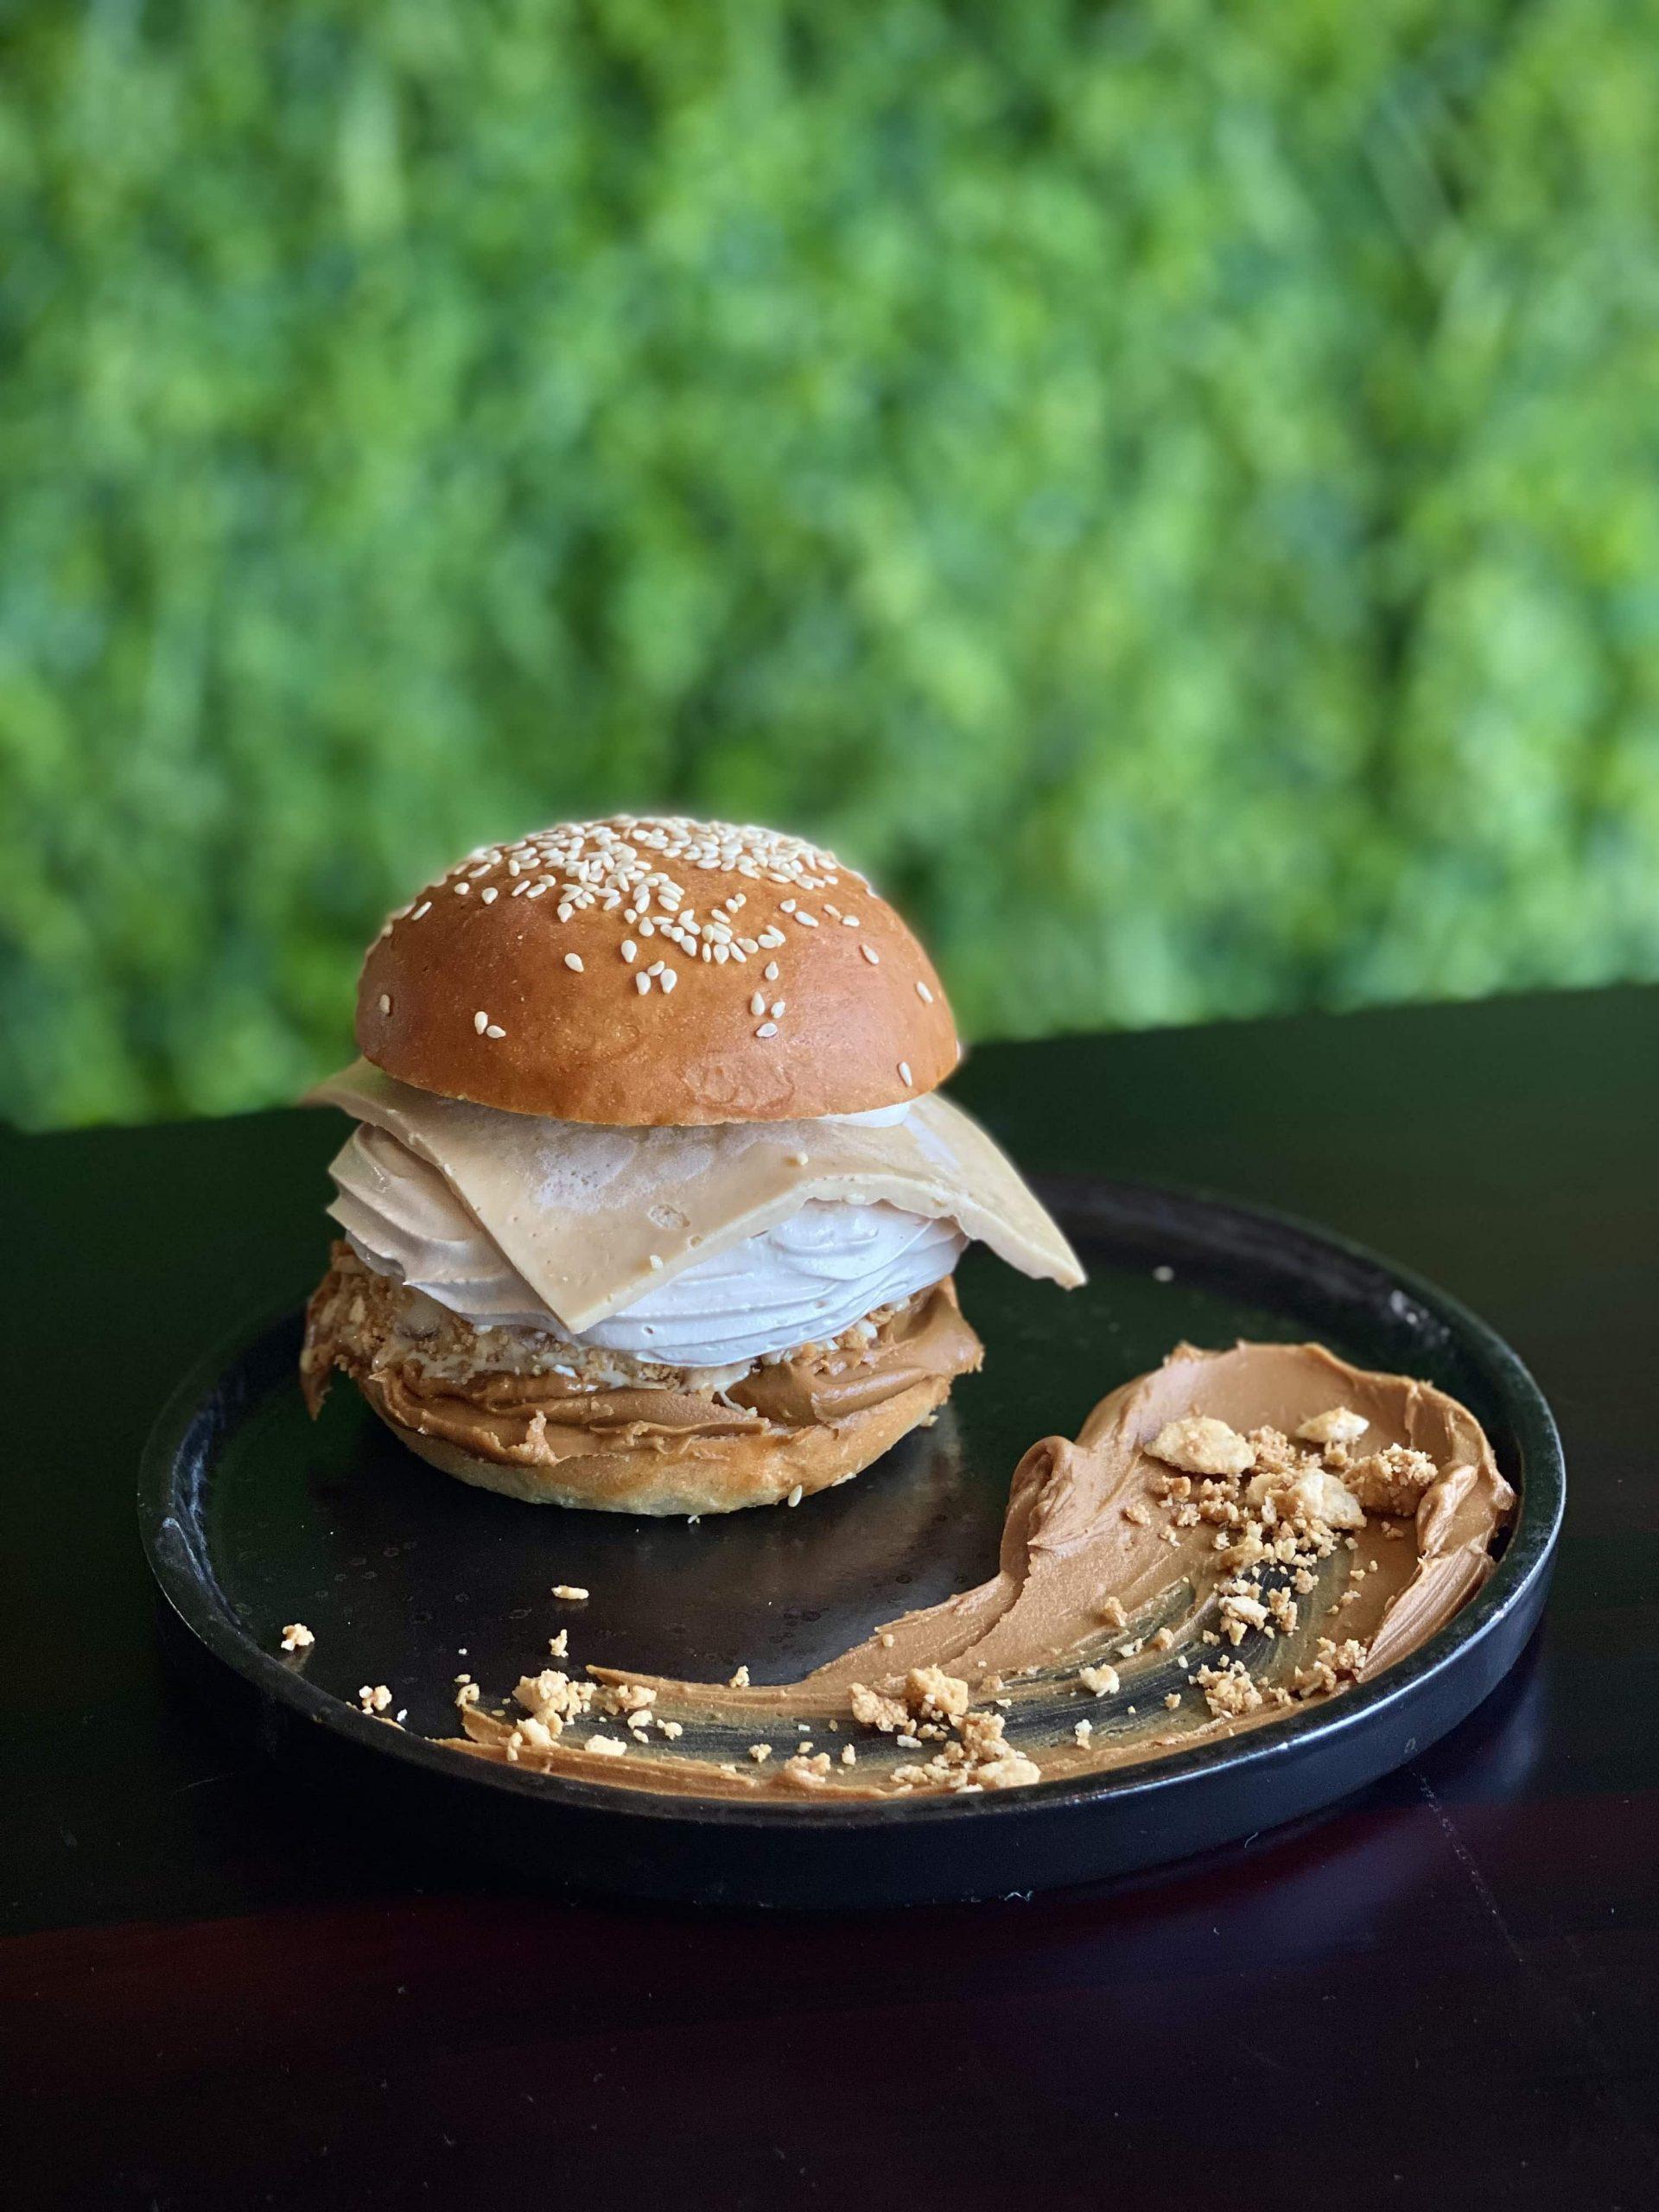 International Burger Day